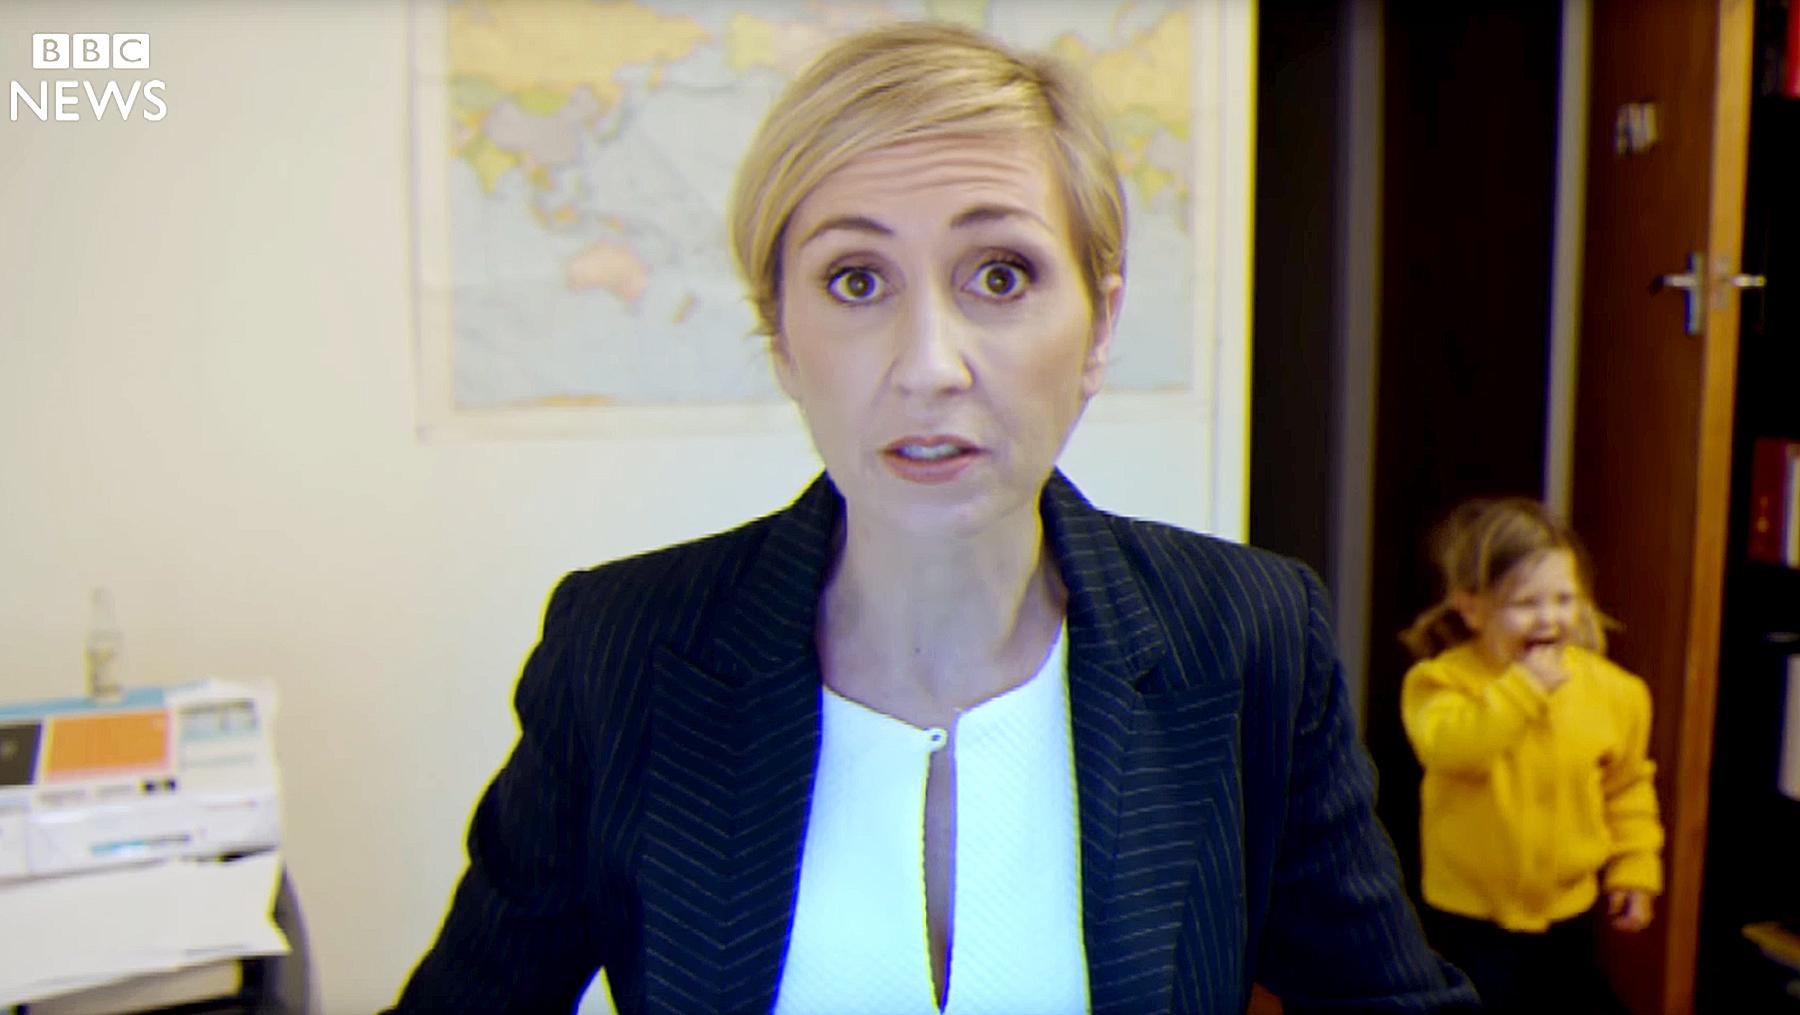 'BBC Mom' parody